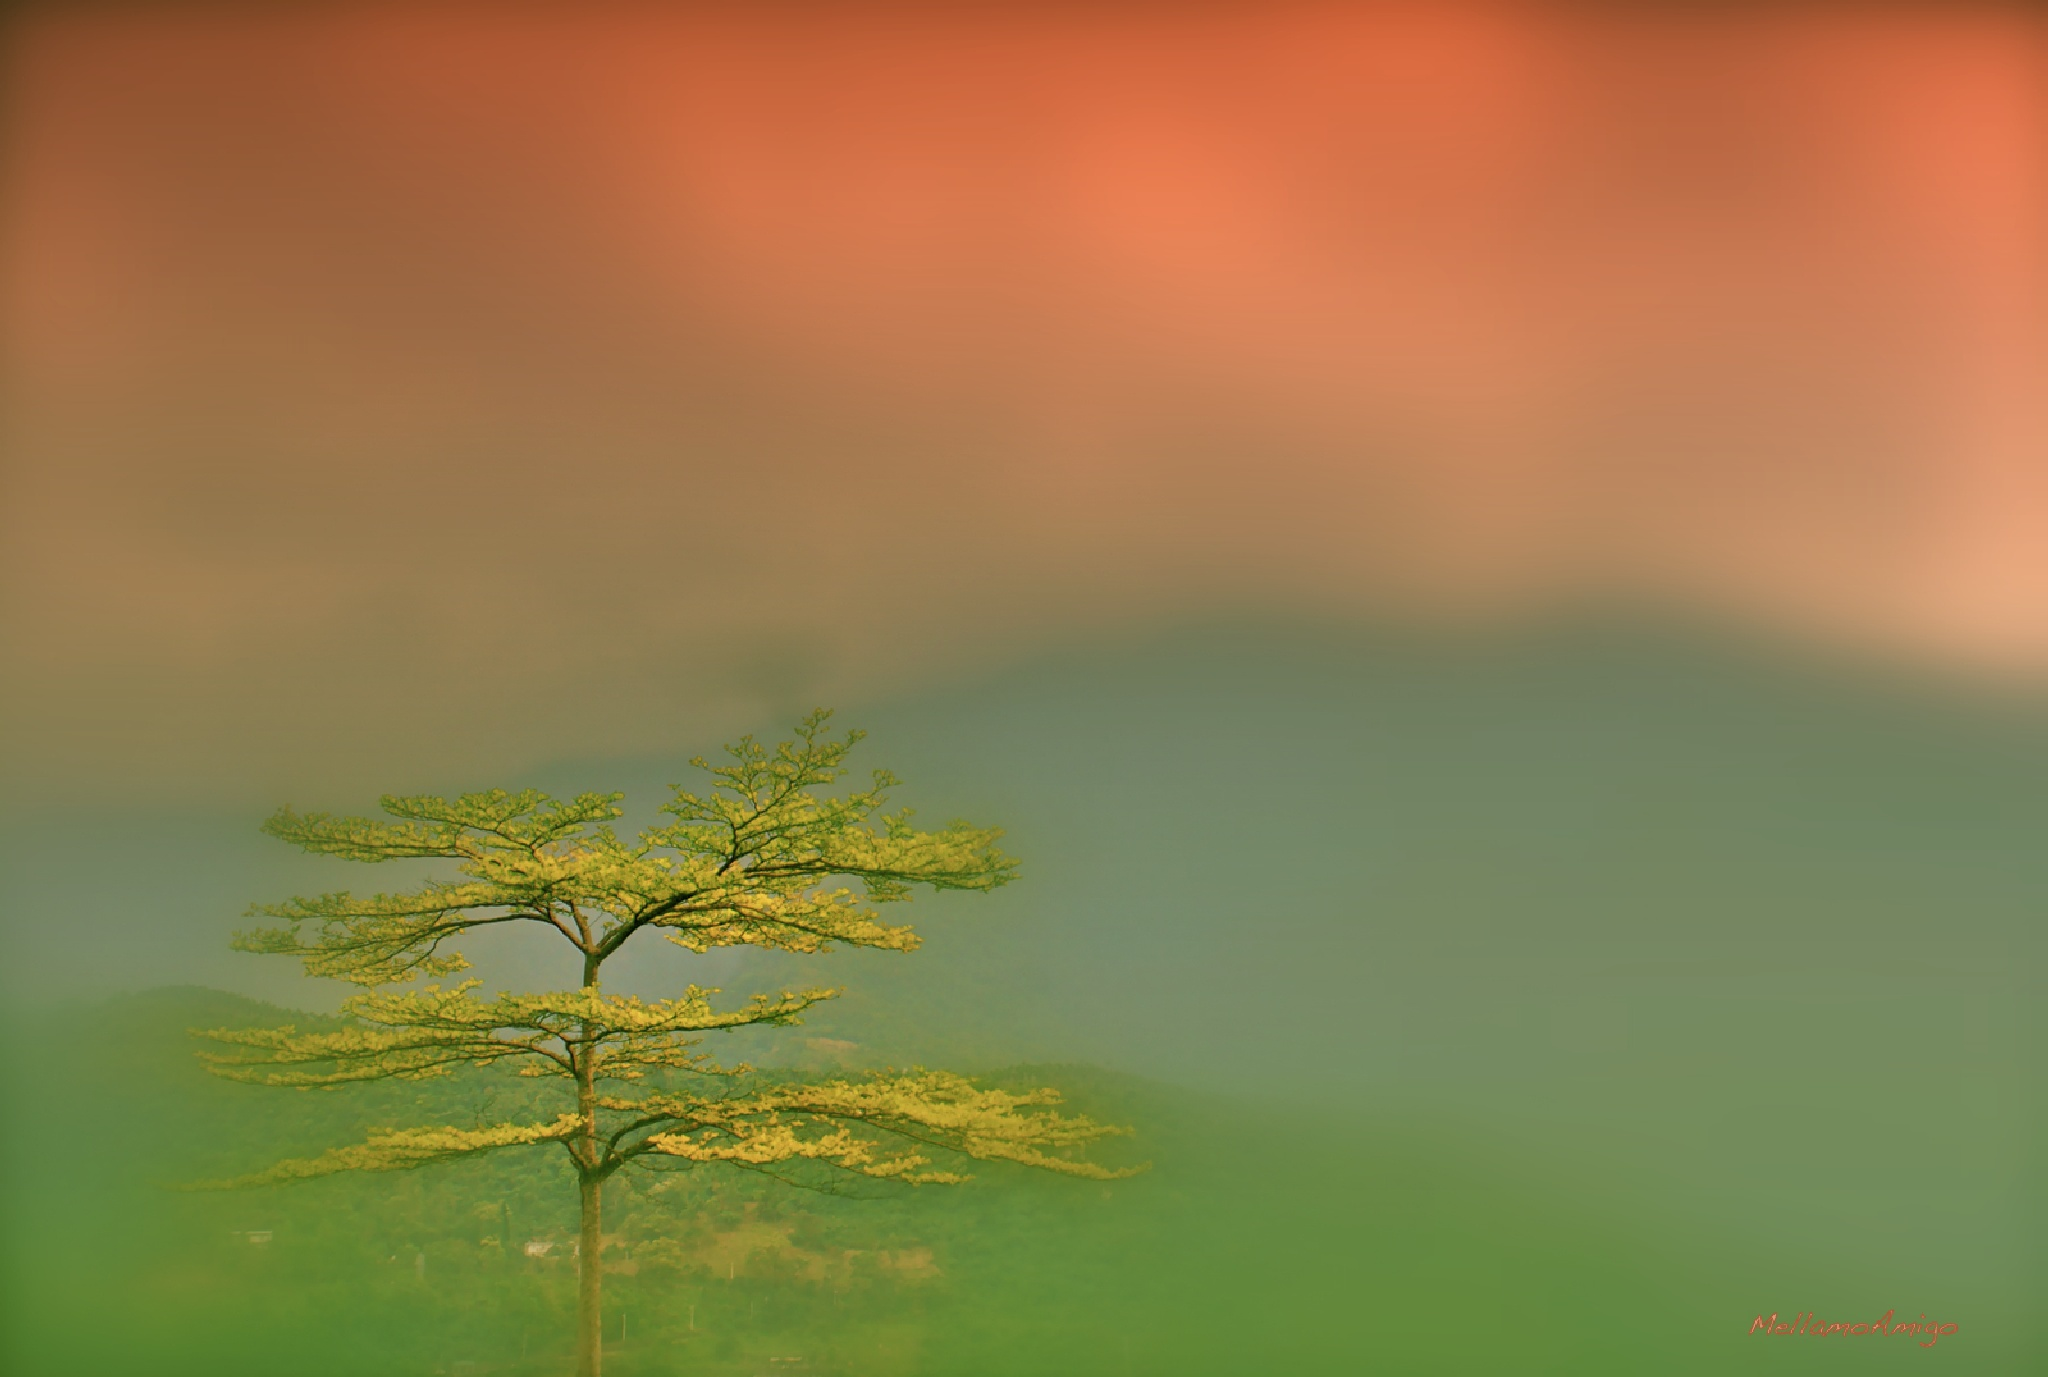 nature in mood  by Mellamo Atef Amigo Aziz